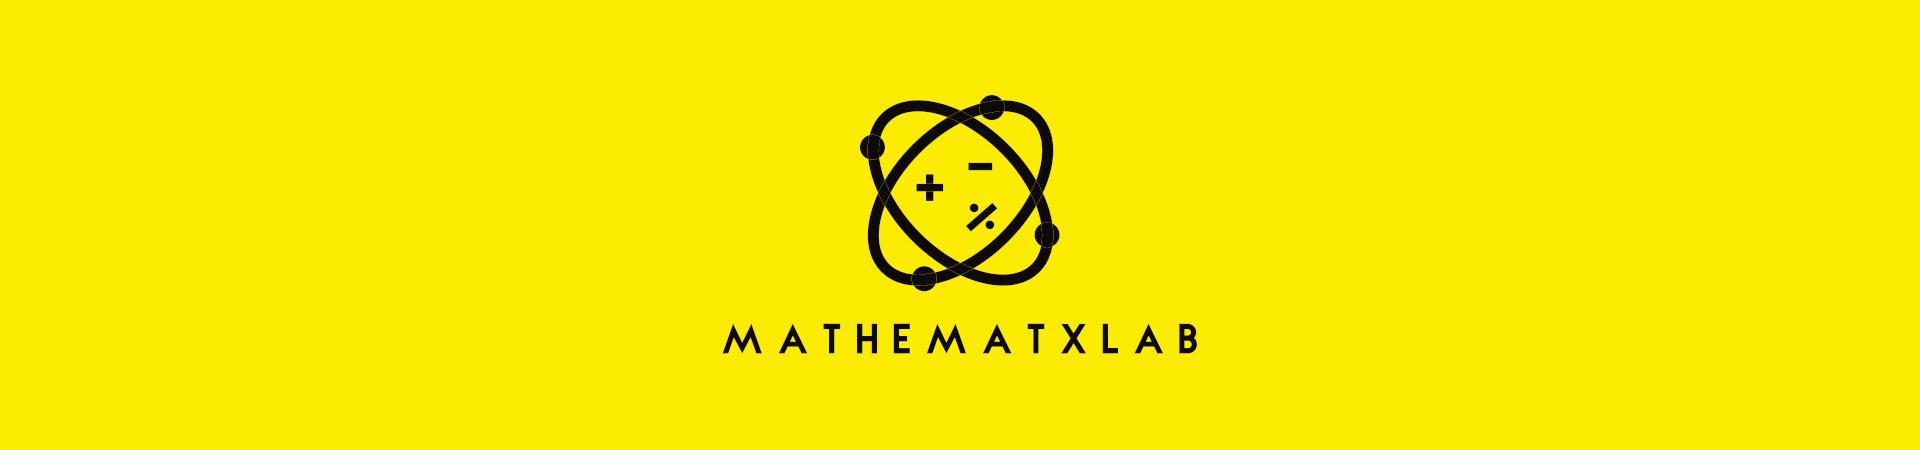 mathematxlab